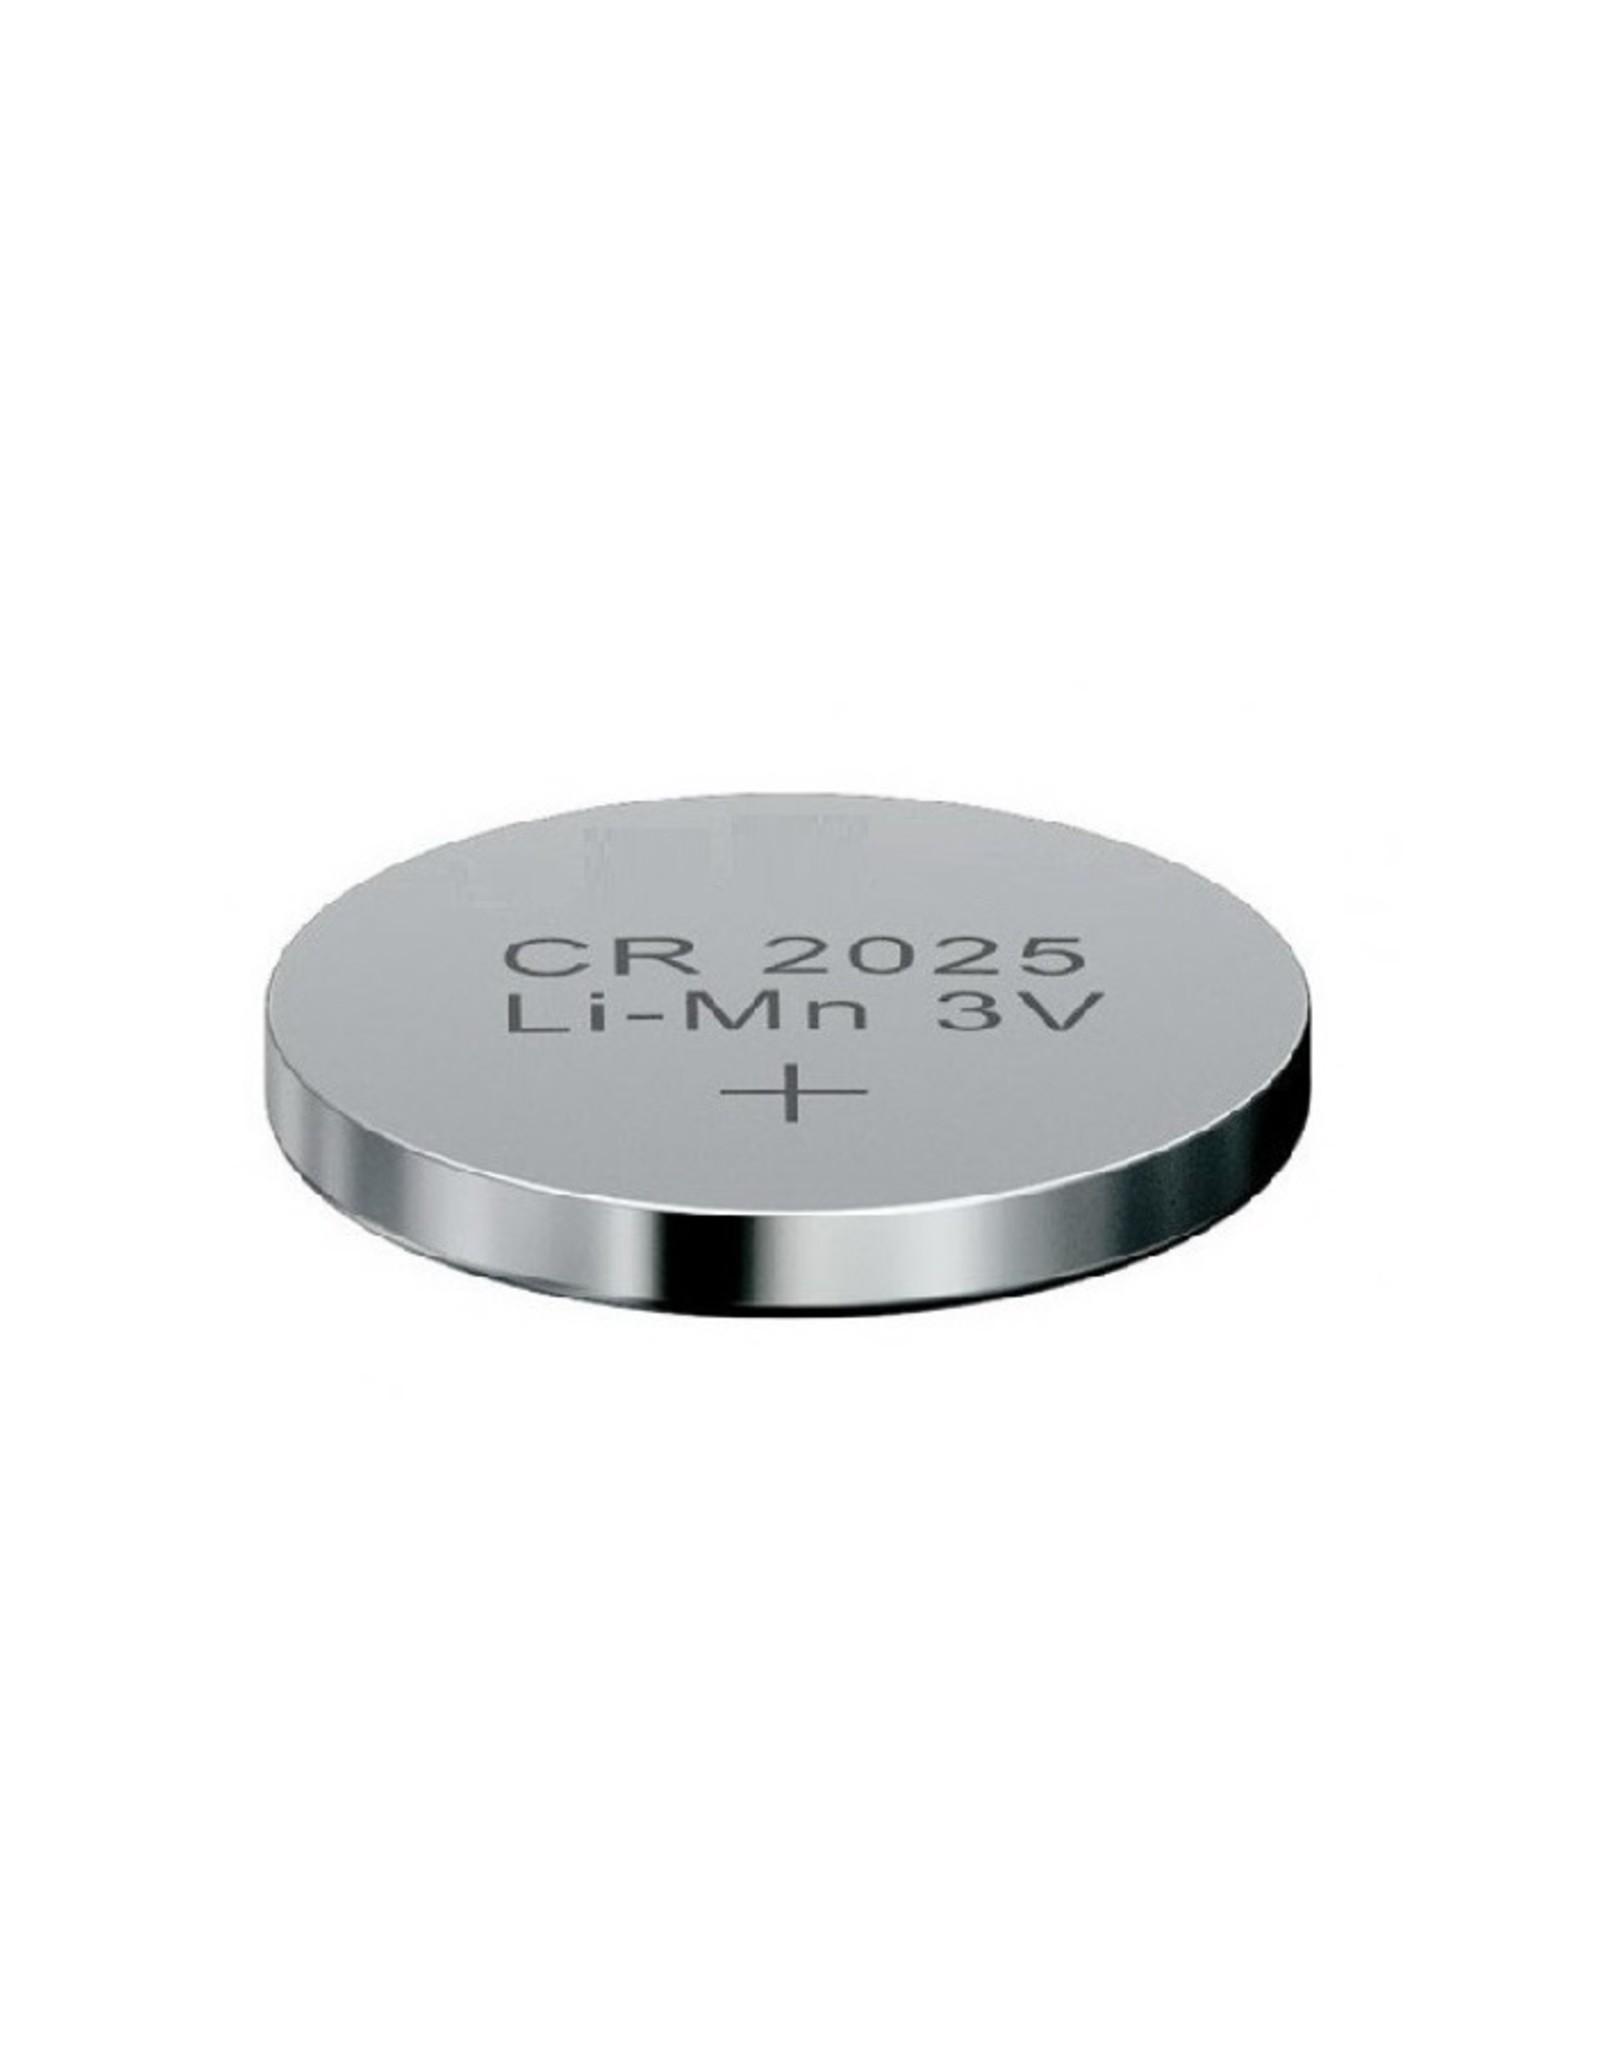 Duracell 3 Volt DR2025 knoopcel reserve batterij